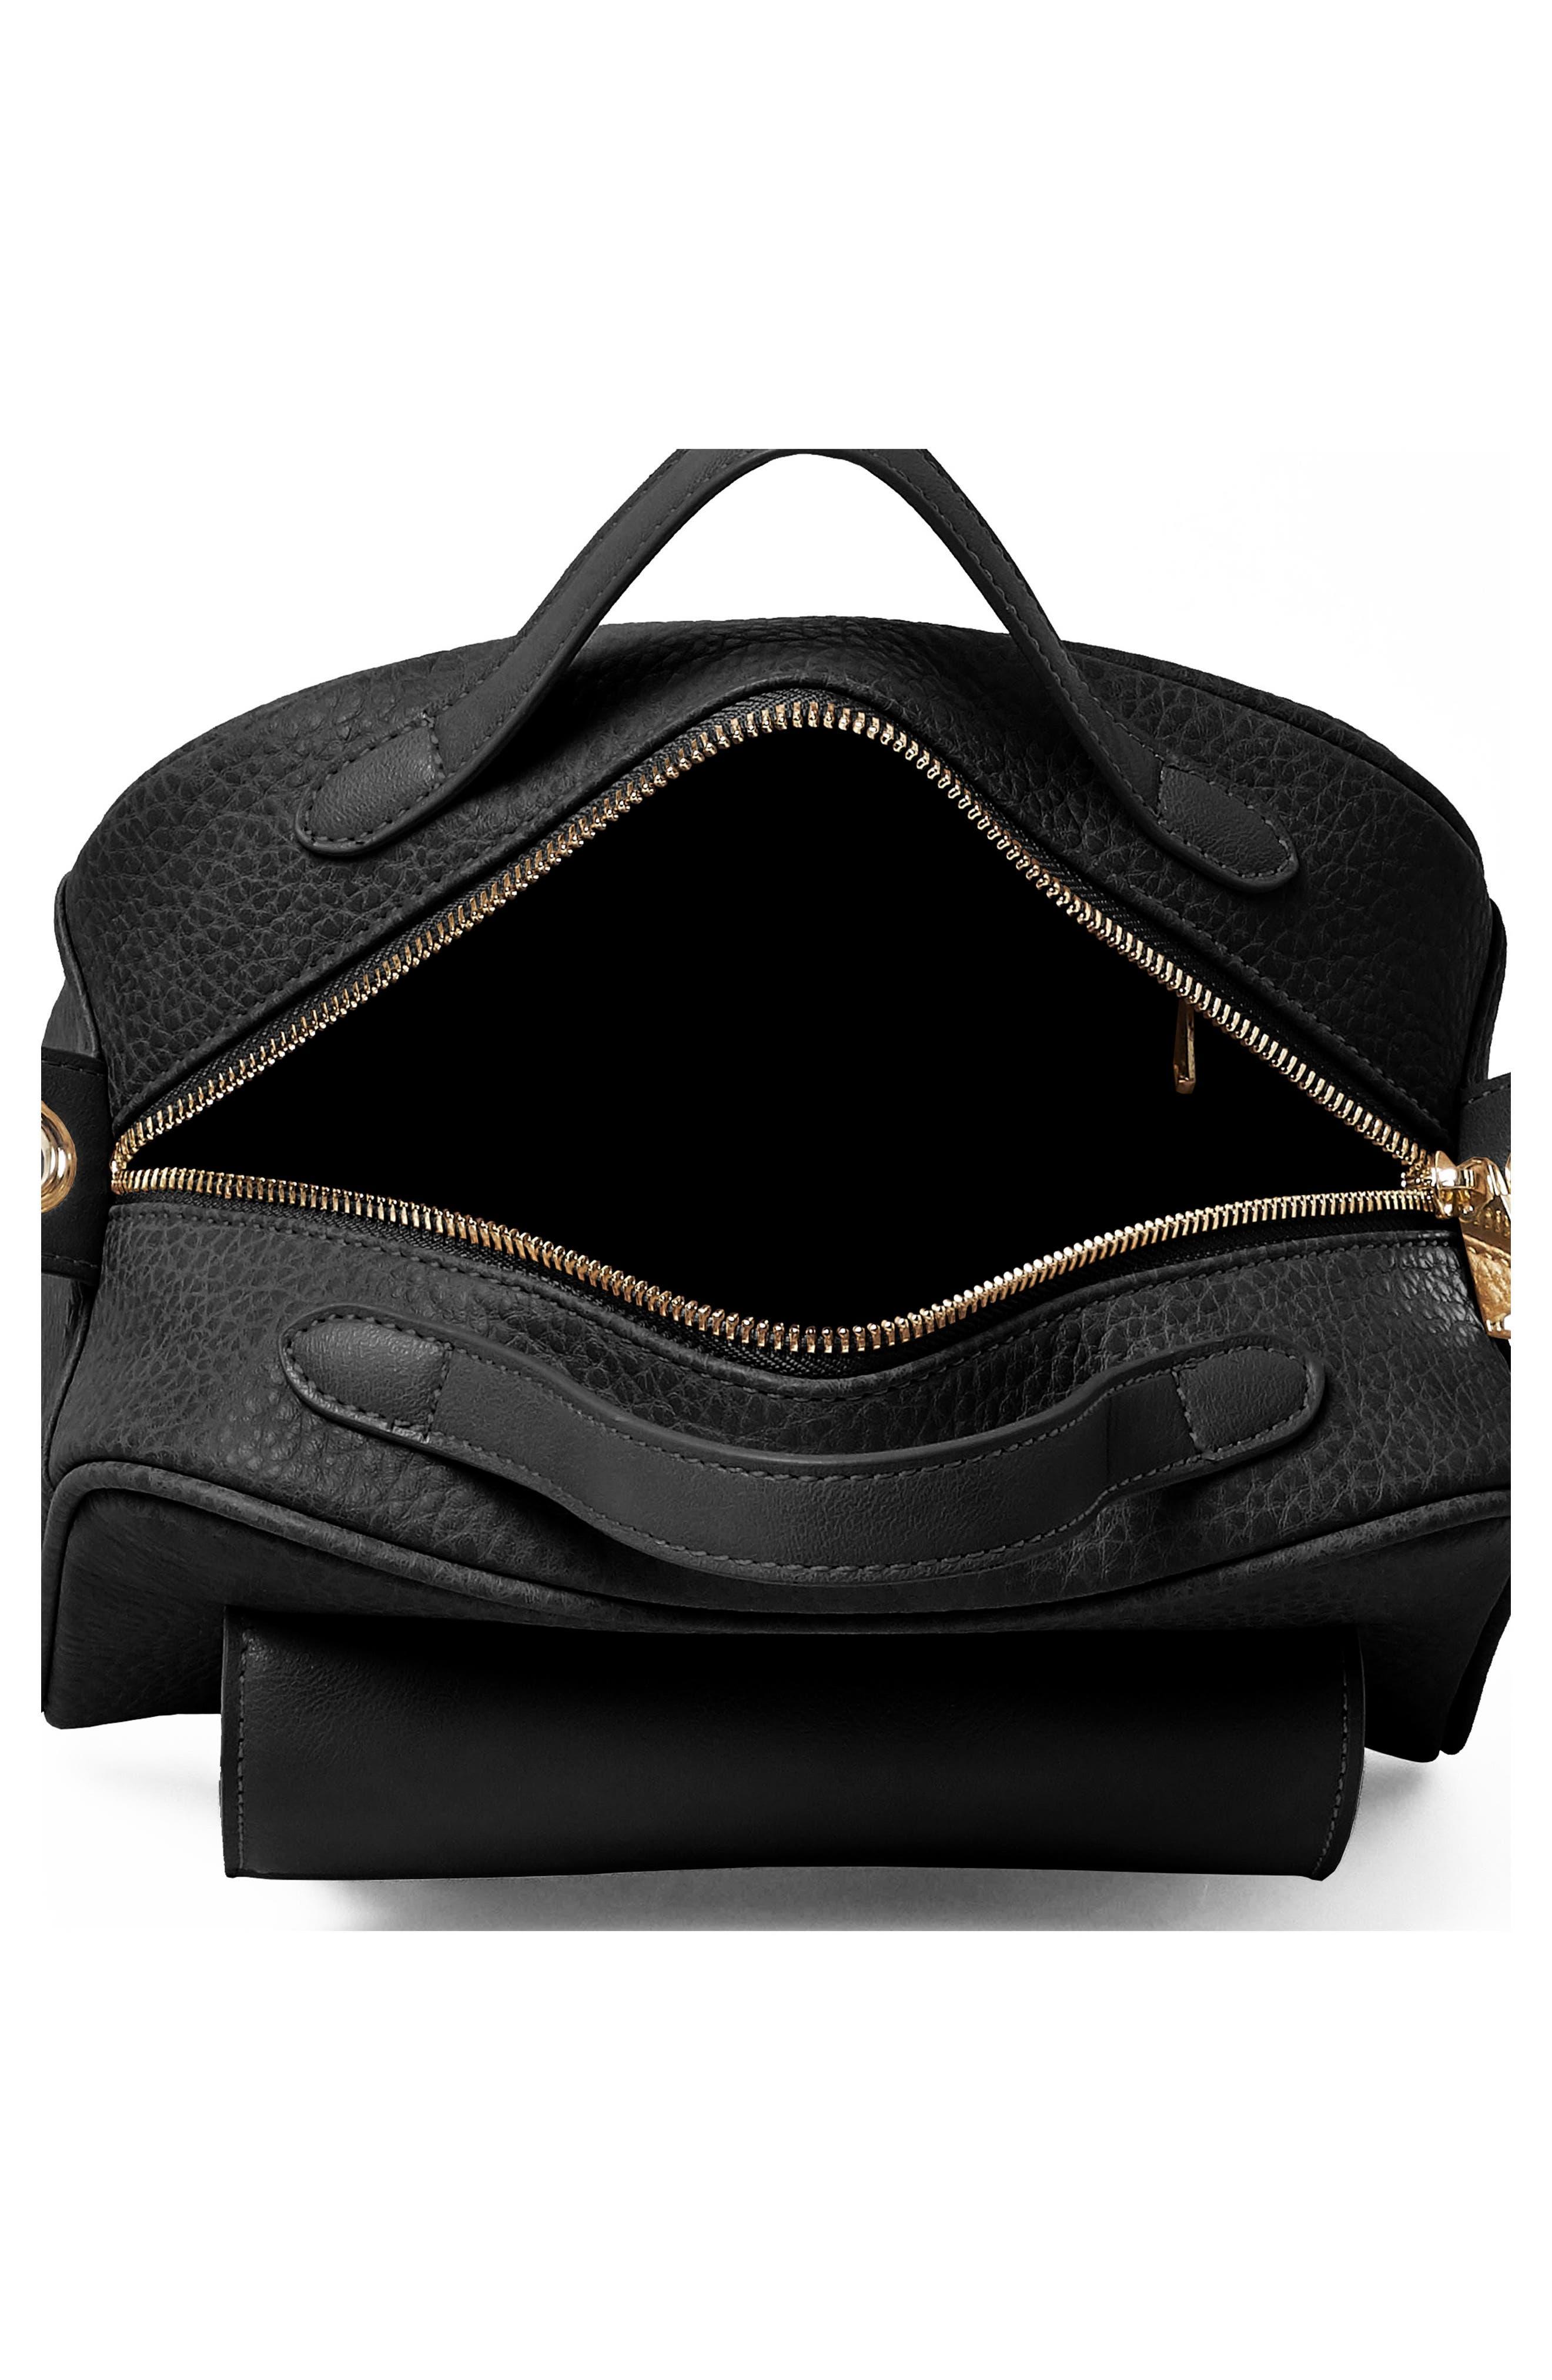 Easy Rider Vegan Leather Crossbody Bag,                             Alternate thumbnail 4, color,